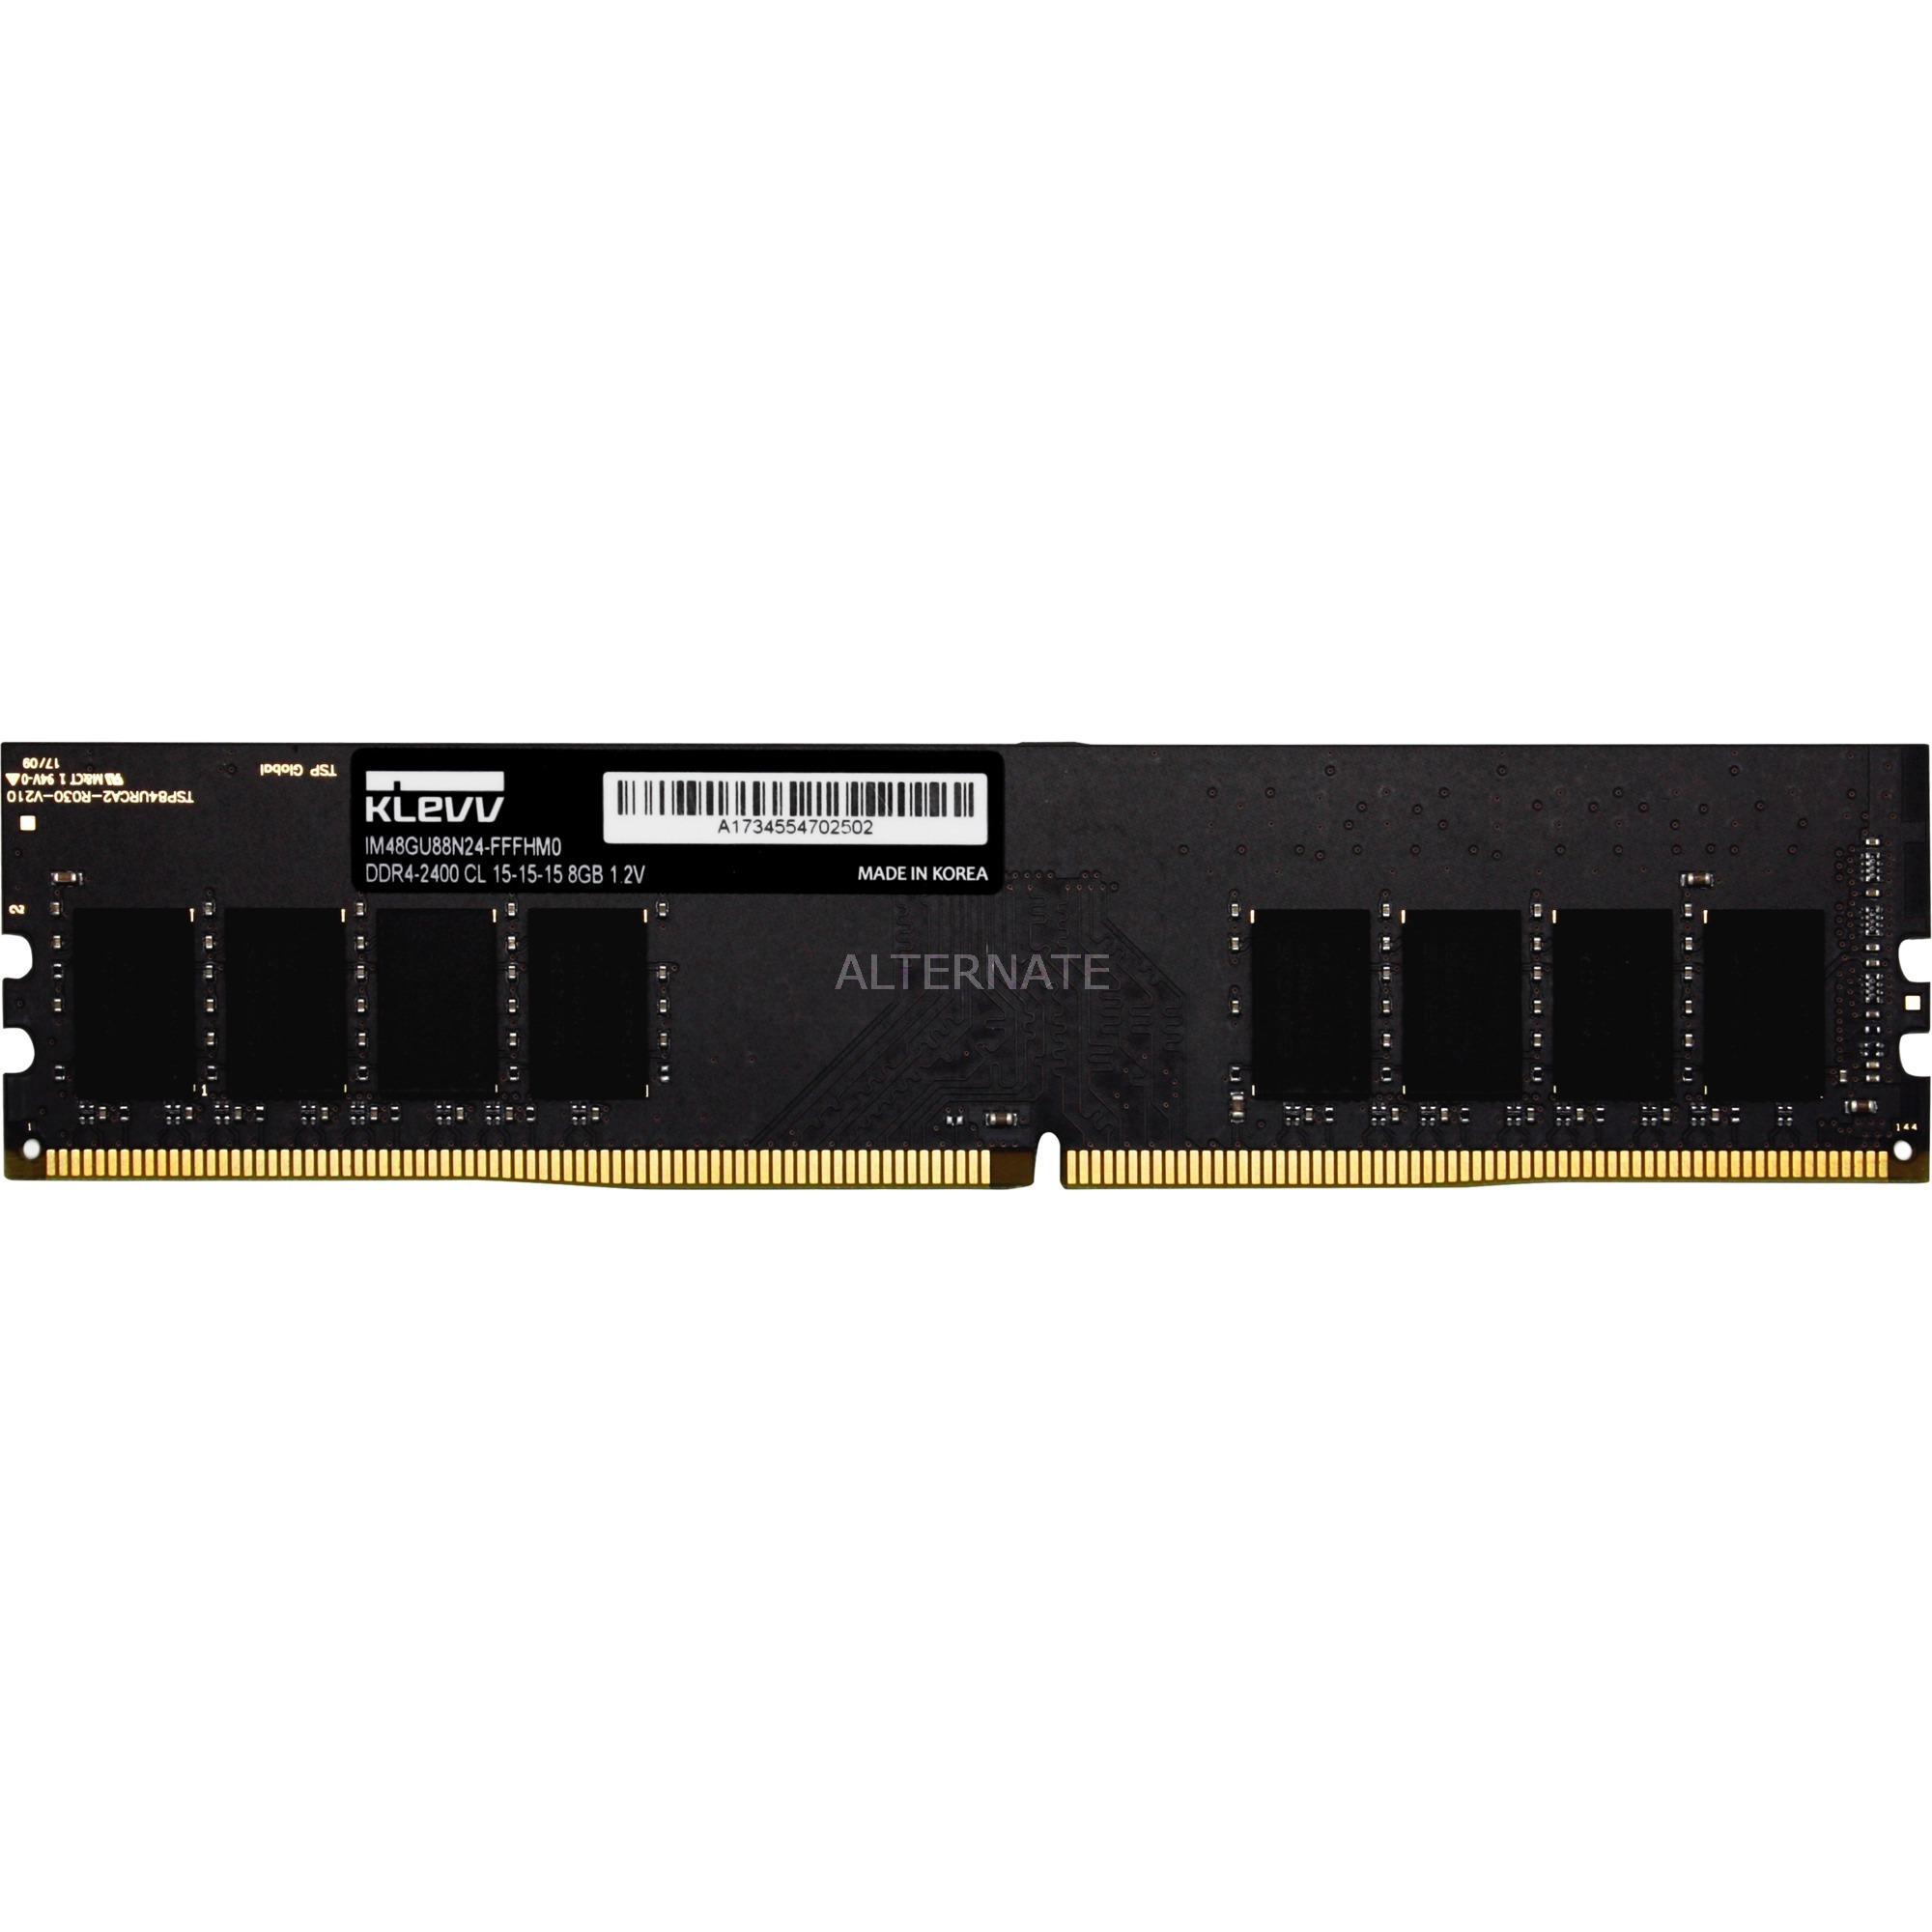 IM48GU88N26-GIIH*0, Memoria RAM